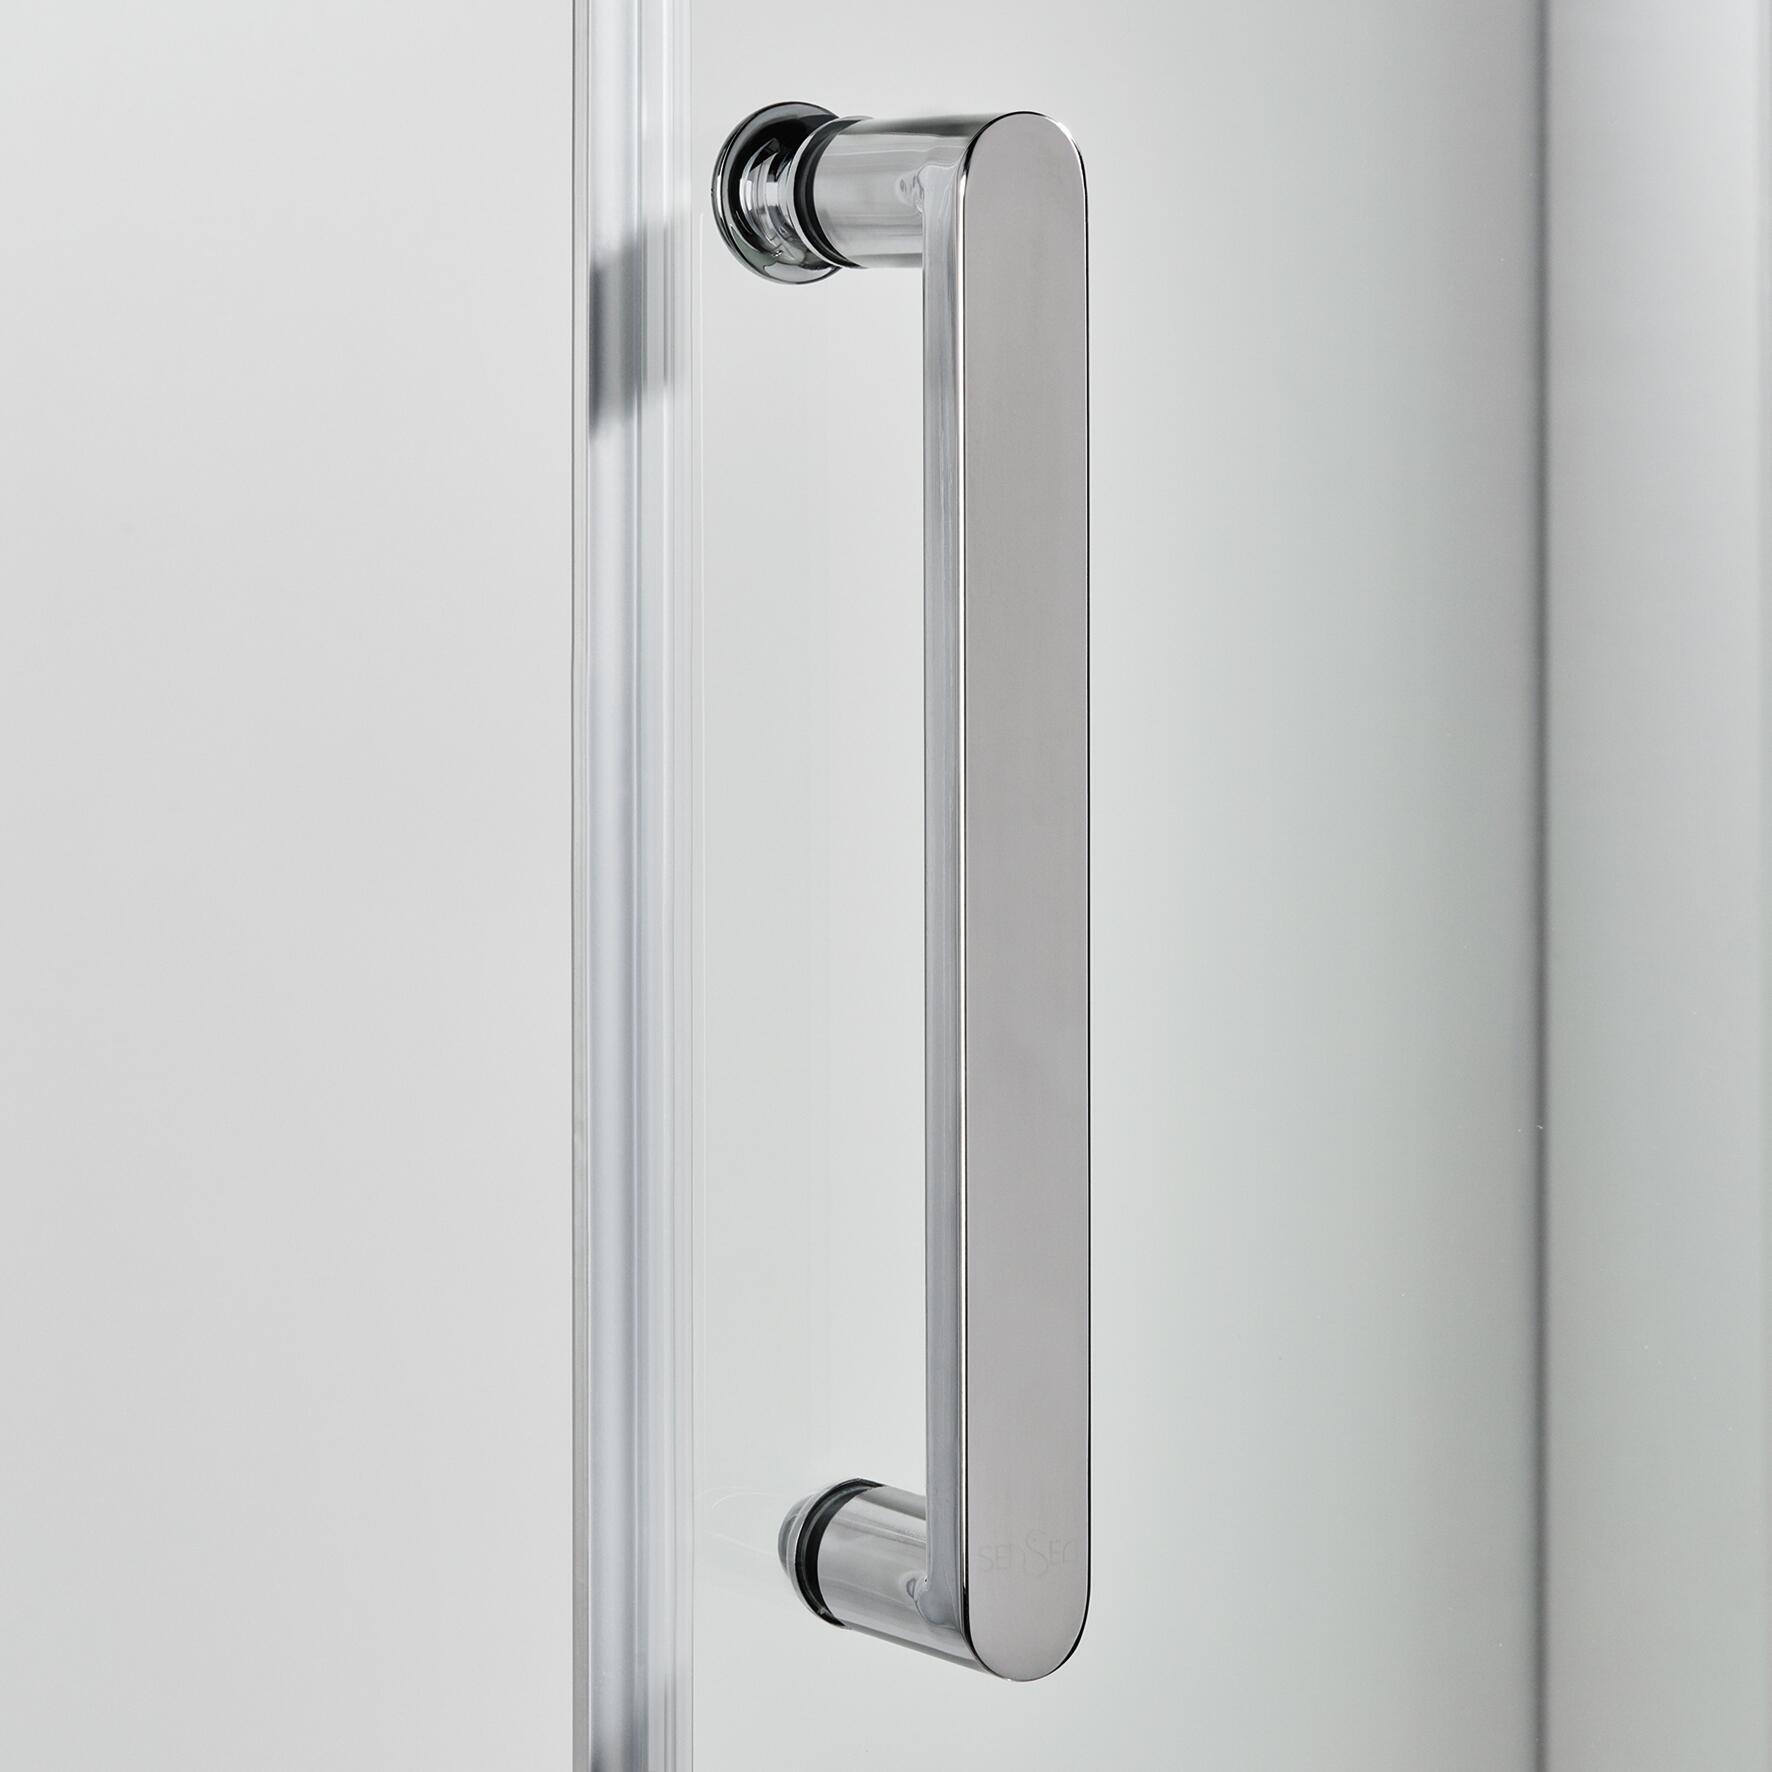 Porta doccia scorrevole Quad 100 cm, H 190 cm in vetro, spessore 6 mm trasparente satinato - 7